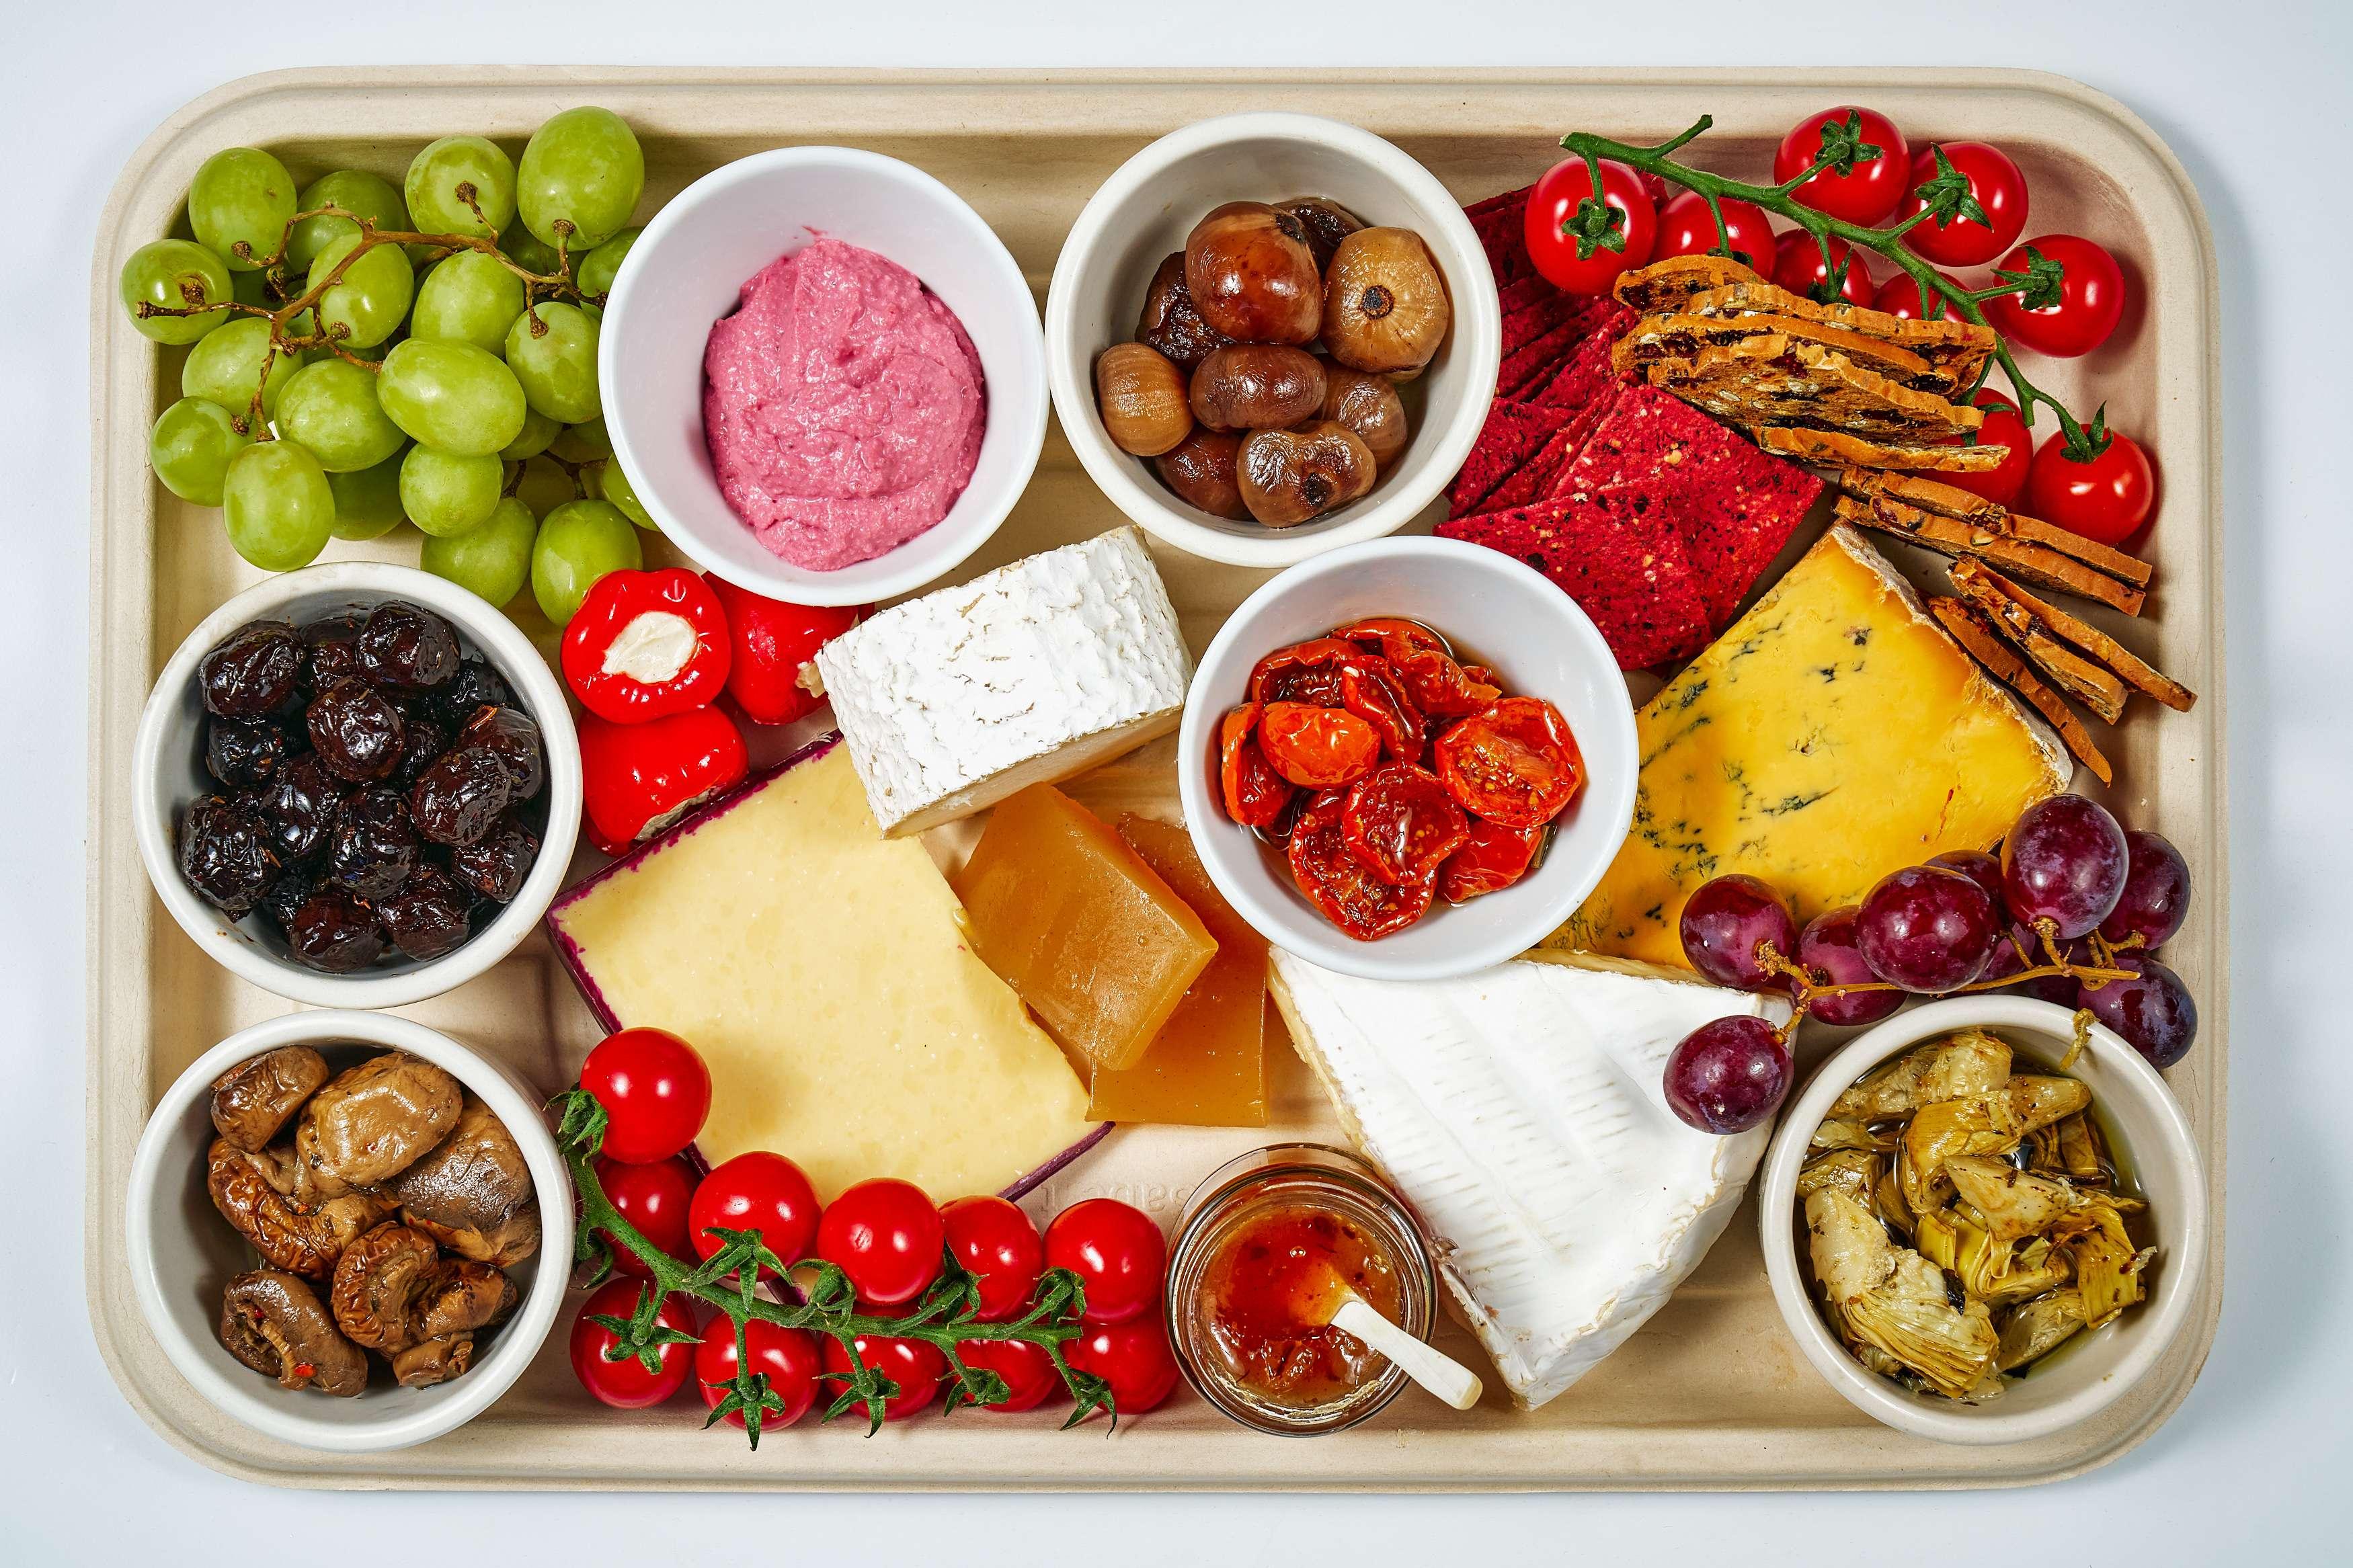 Vegetarian Cheese & Antipasti Platter (Small) Picnic Goods